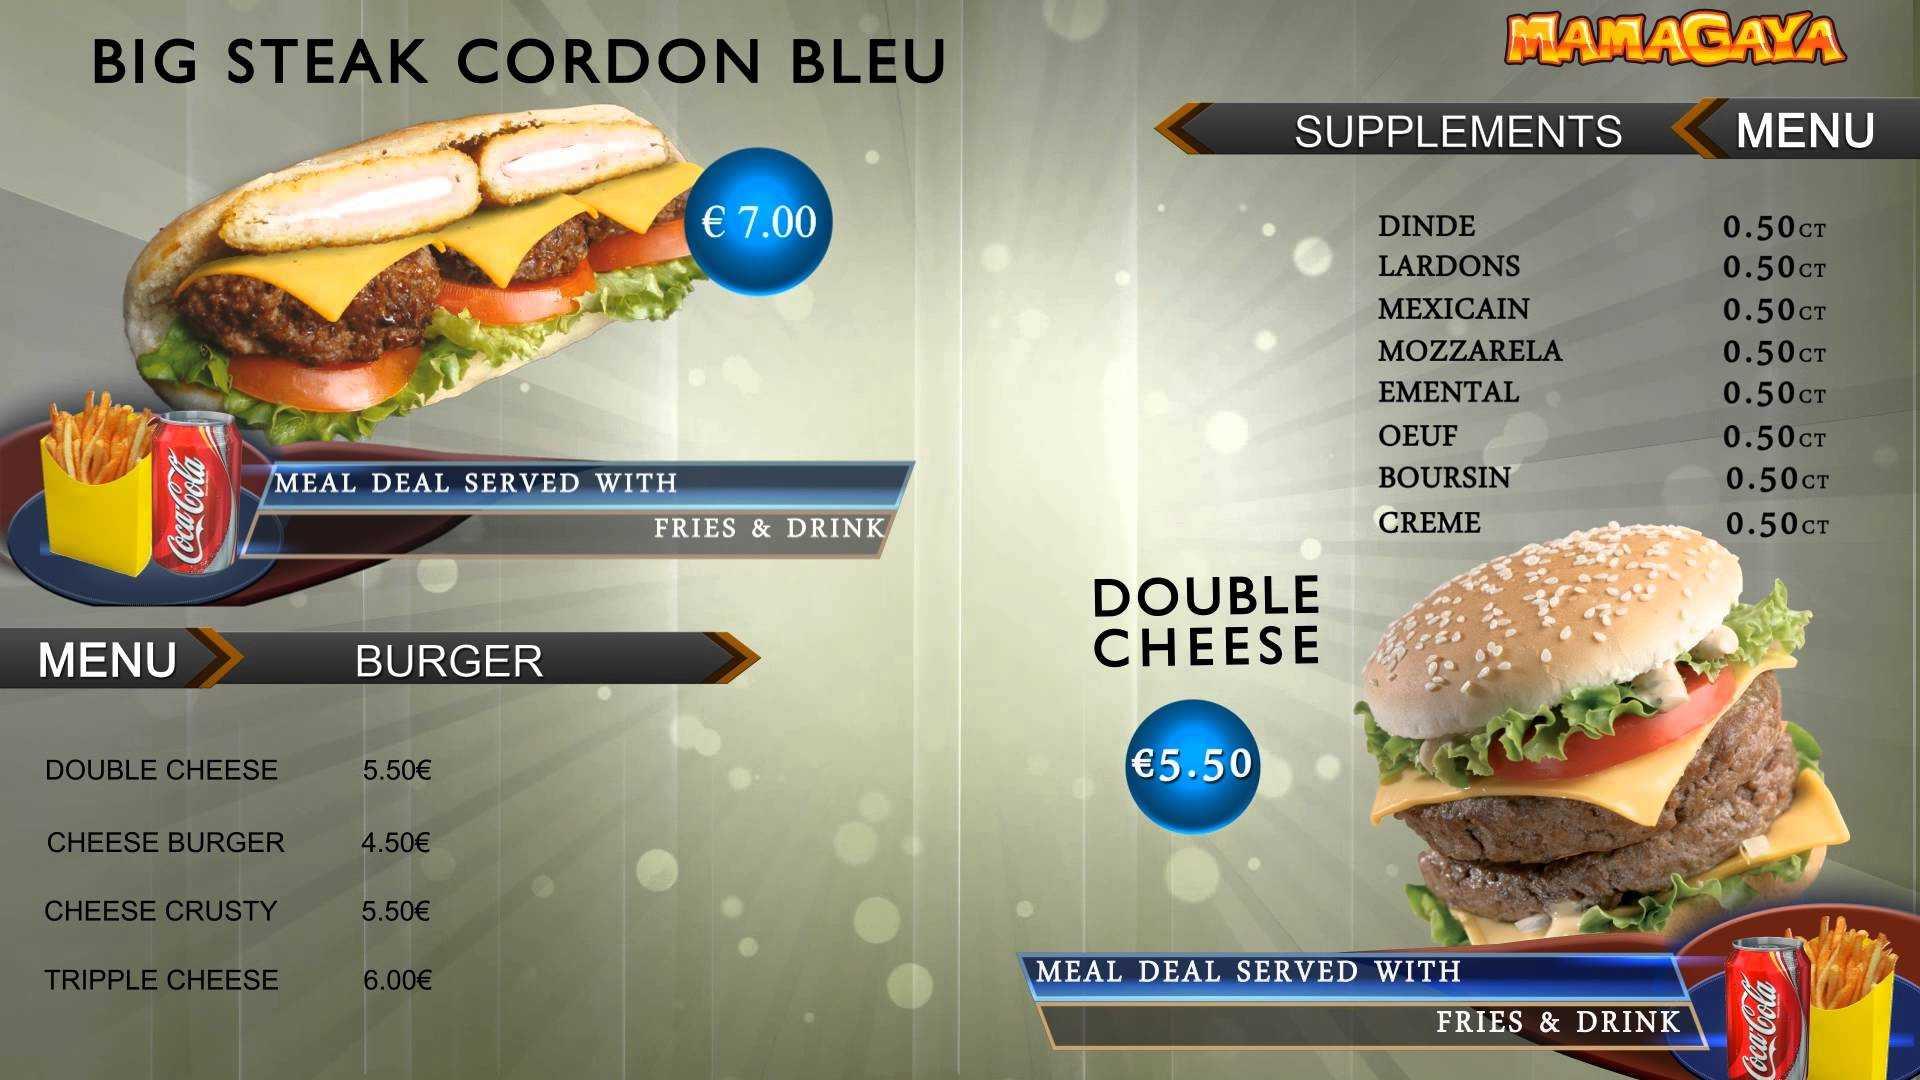 Digital Signage Video Template Restaurant Menu – Top2D3D Studios Regarding Digital Menu Templates Free